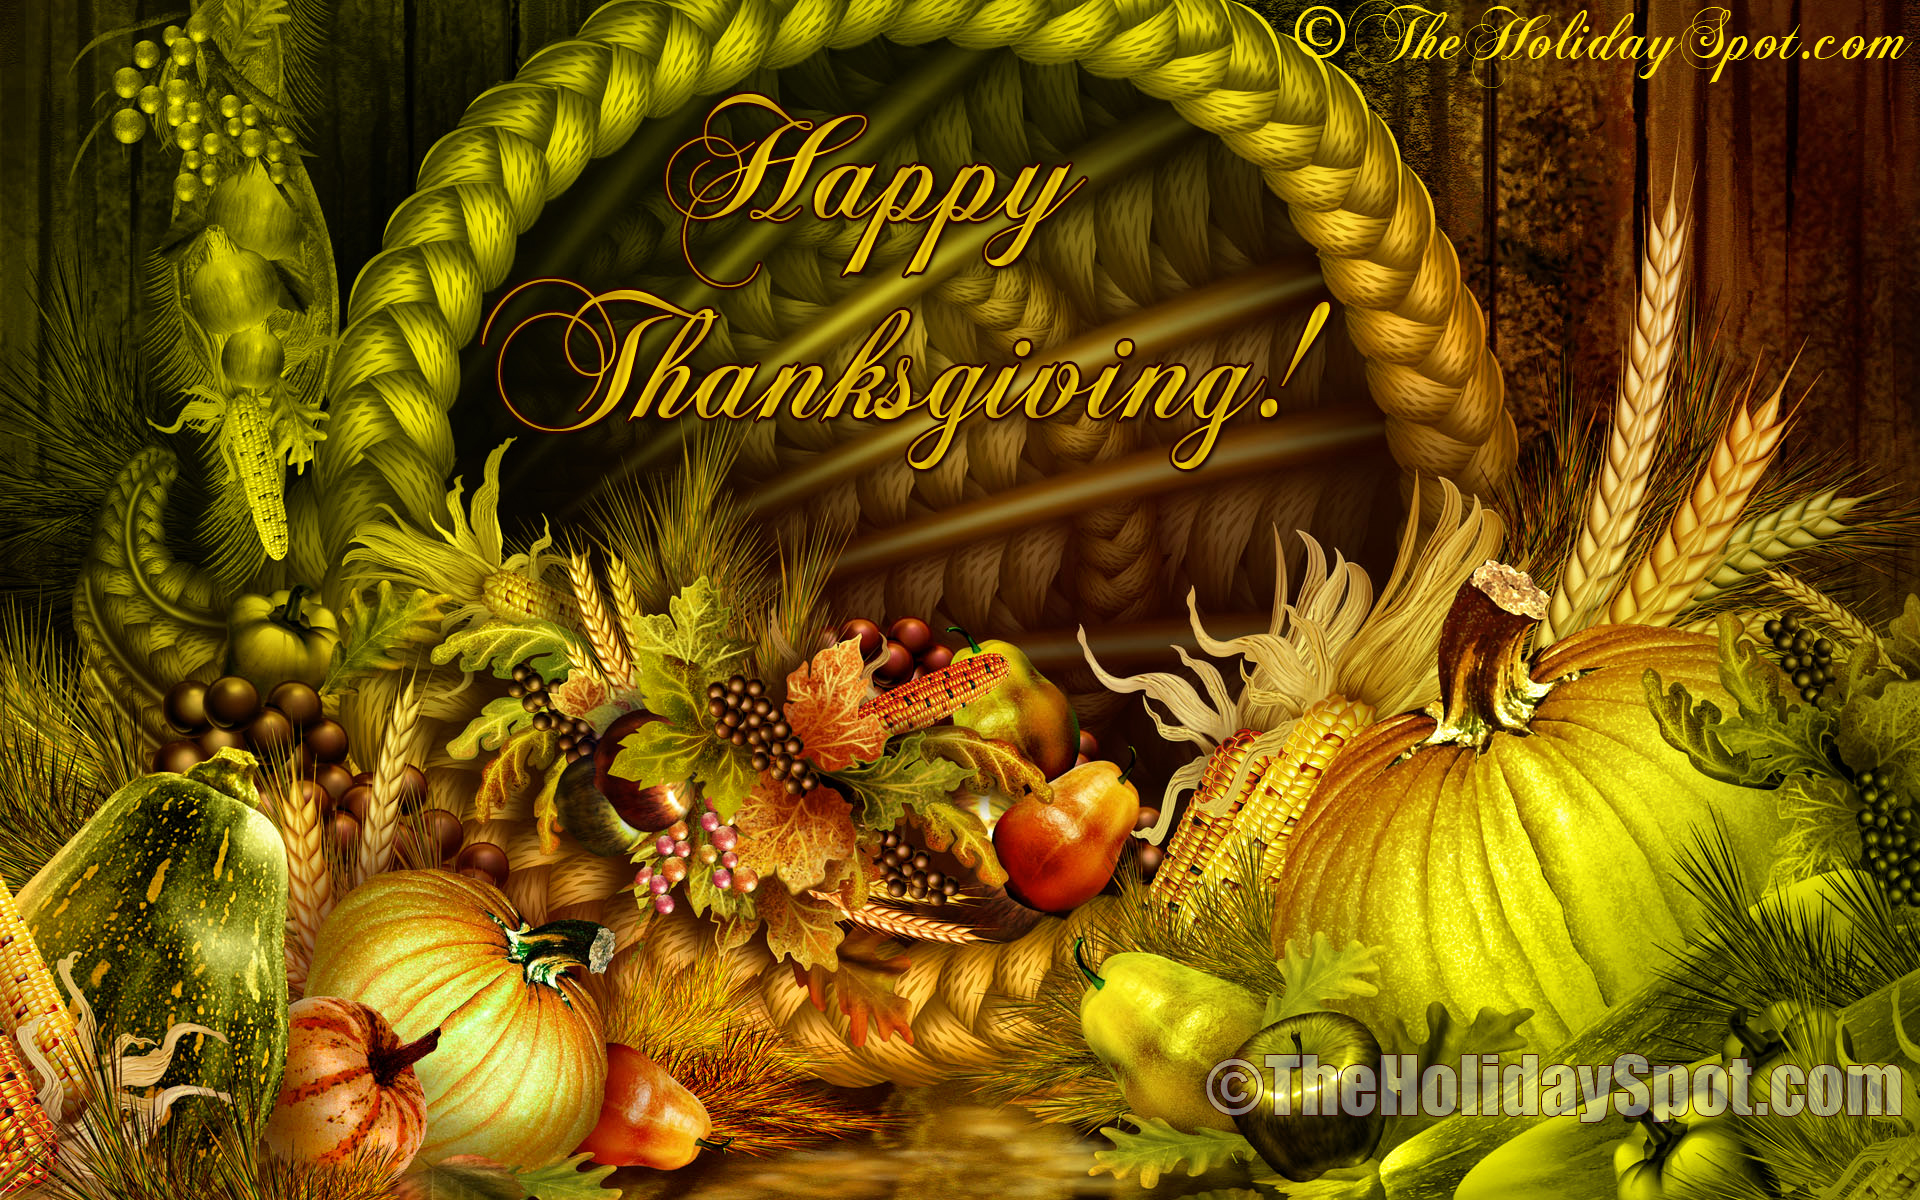 comwp contentuploads201111free thanksgiving wallpaperjpg 1920x1200